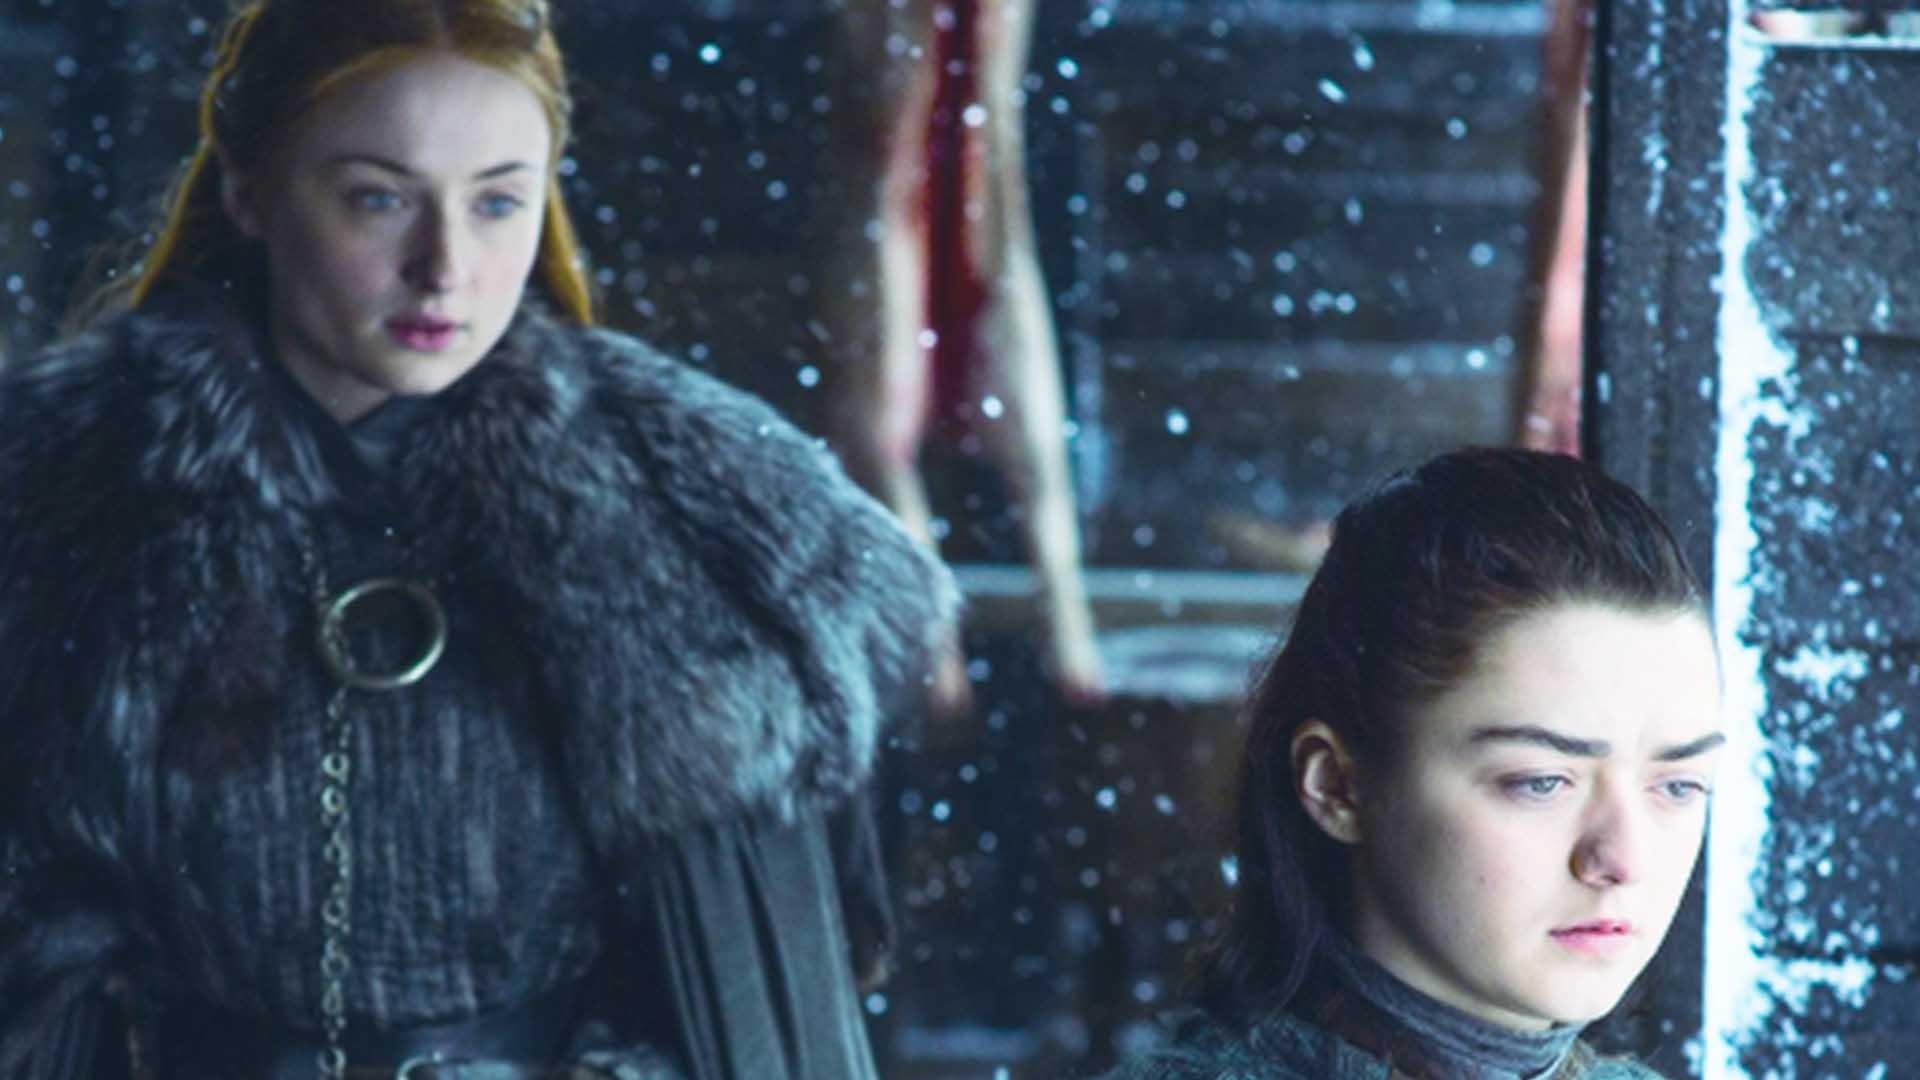 Seppure su fronti opposti, sia Sansa che Arya Stark sono protagoniste femminili indipendenti e complesse